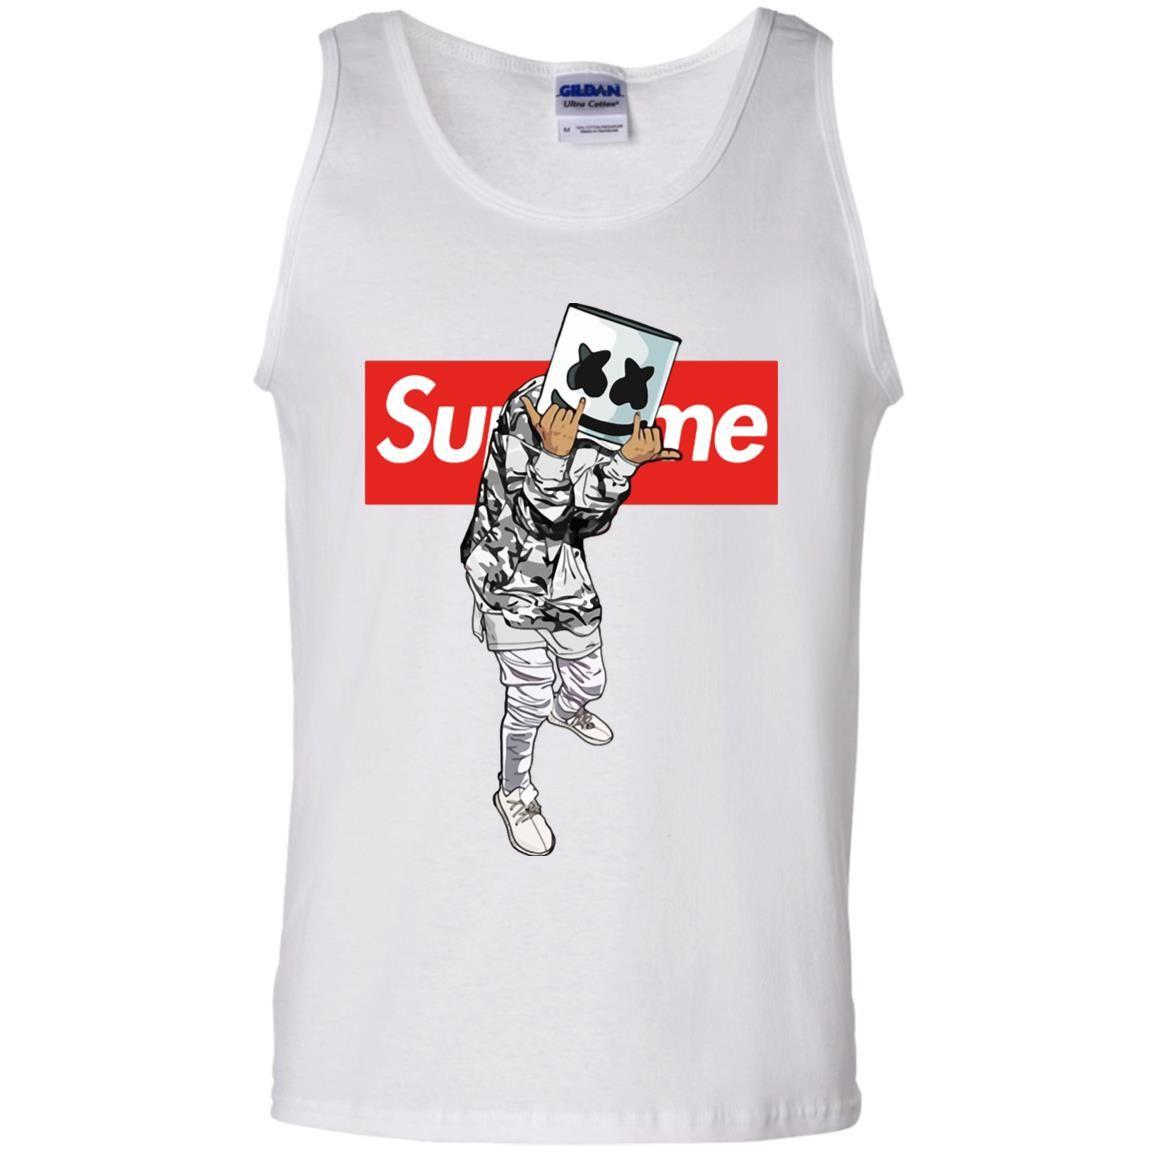 Men/'s Word Art Sleeveless T-shirt Sloth